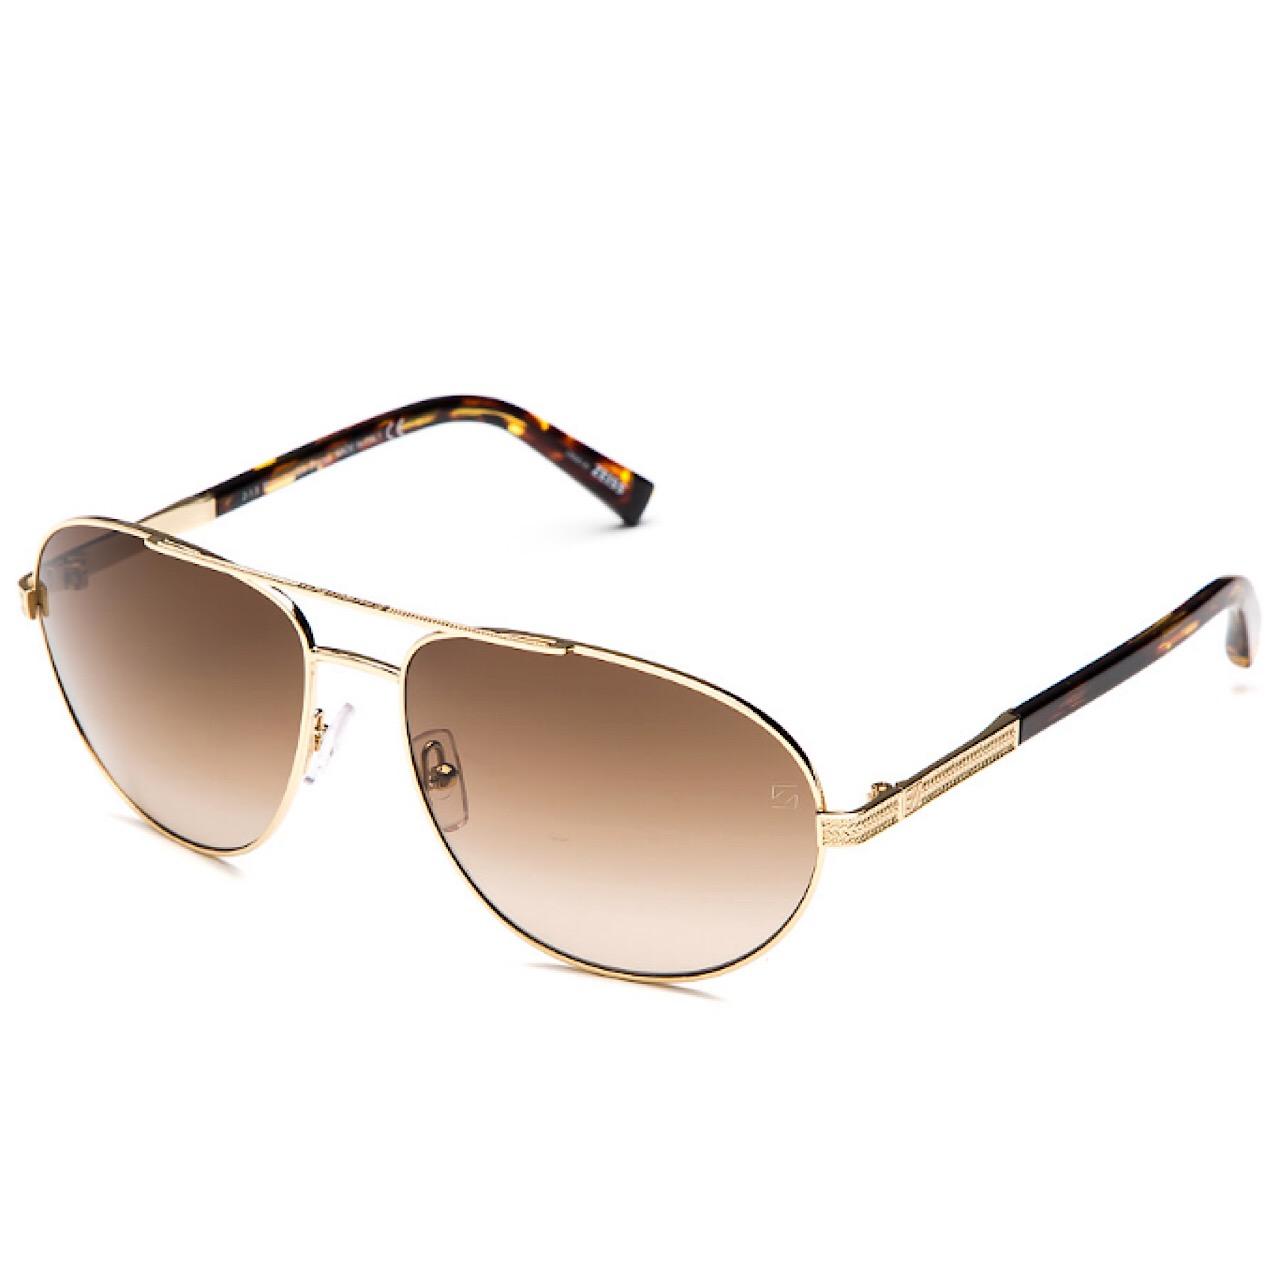 عینک آفتابی ارمنگیلدو زگنا مدل EZ0011